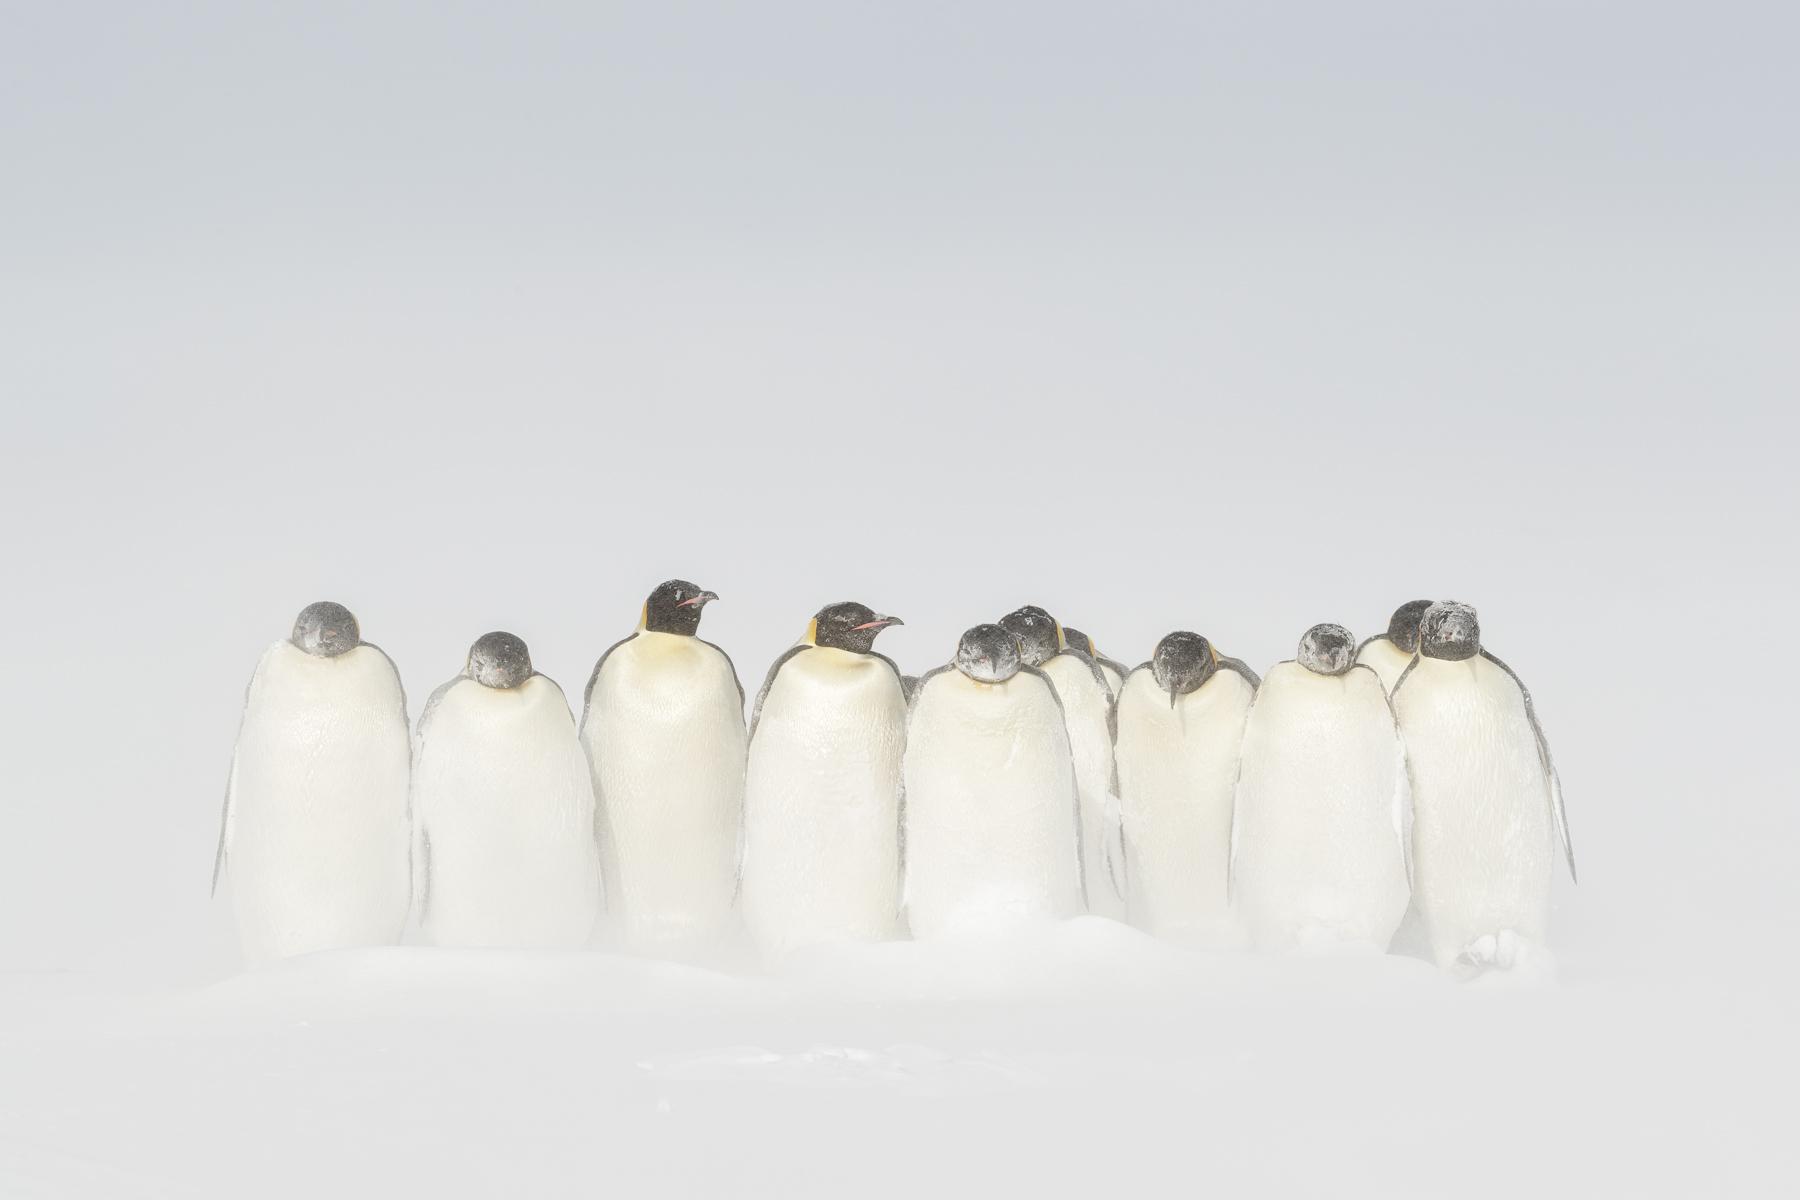 AntarcticaEmperor-1.jpg